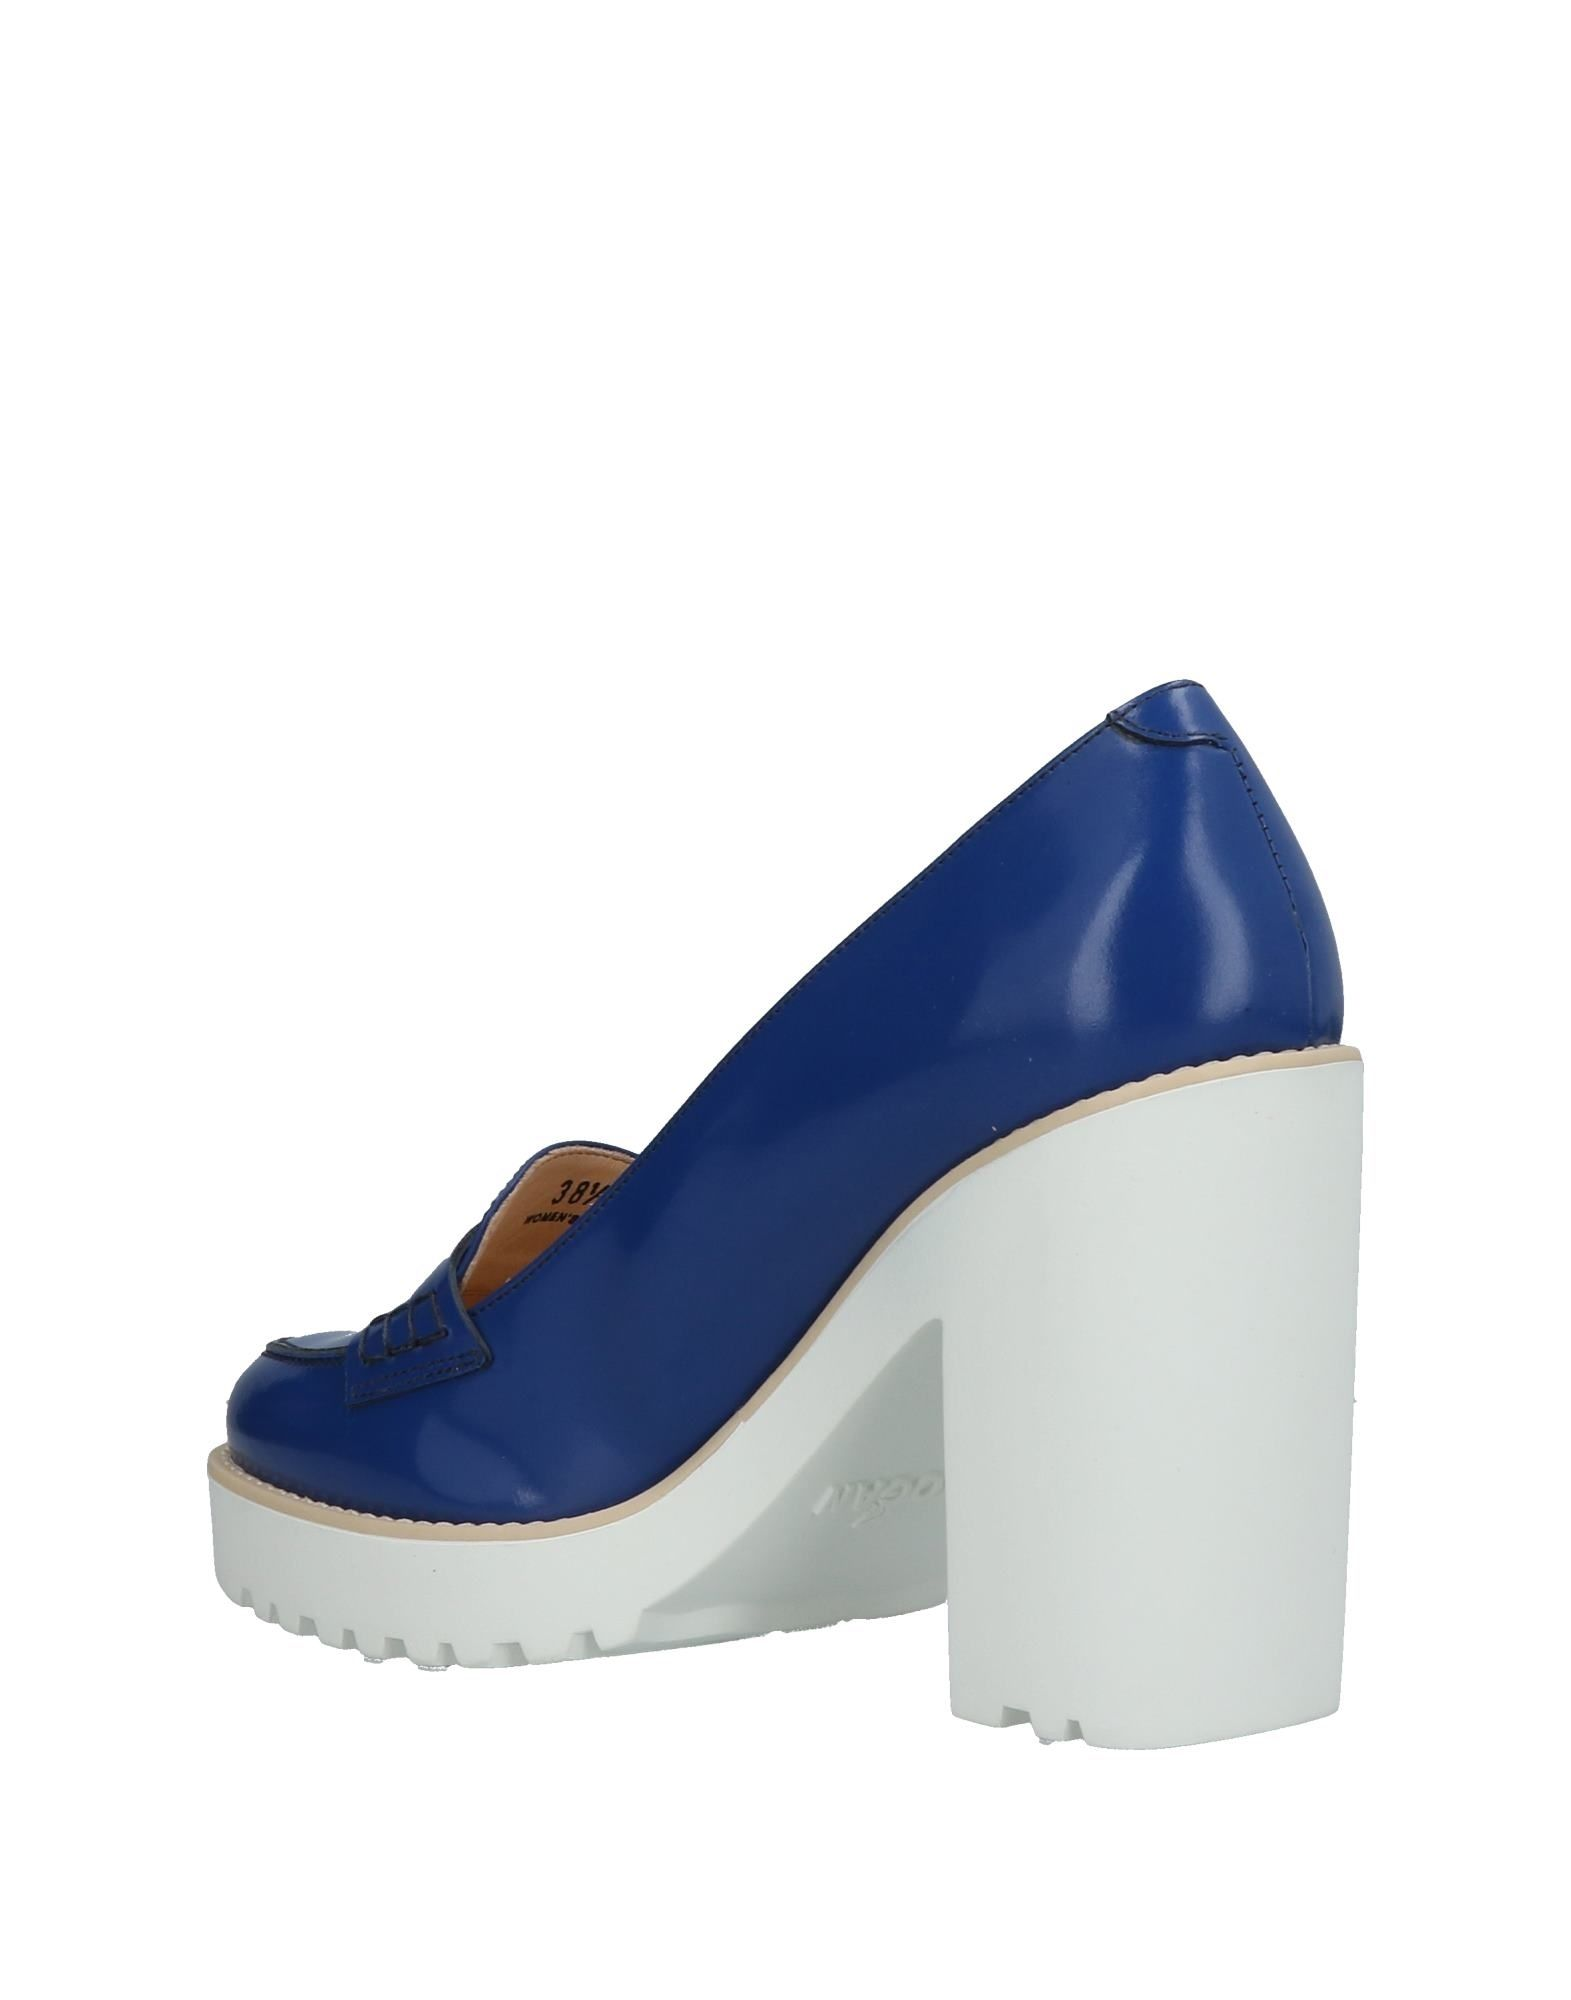 Stilvolle Stilvolle Stilvolle billige Schuhe Hogan Mokassins Damen  11435459JK 5c5f51